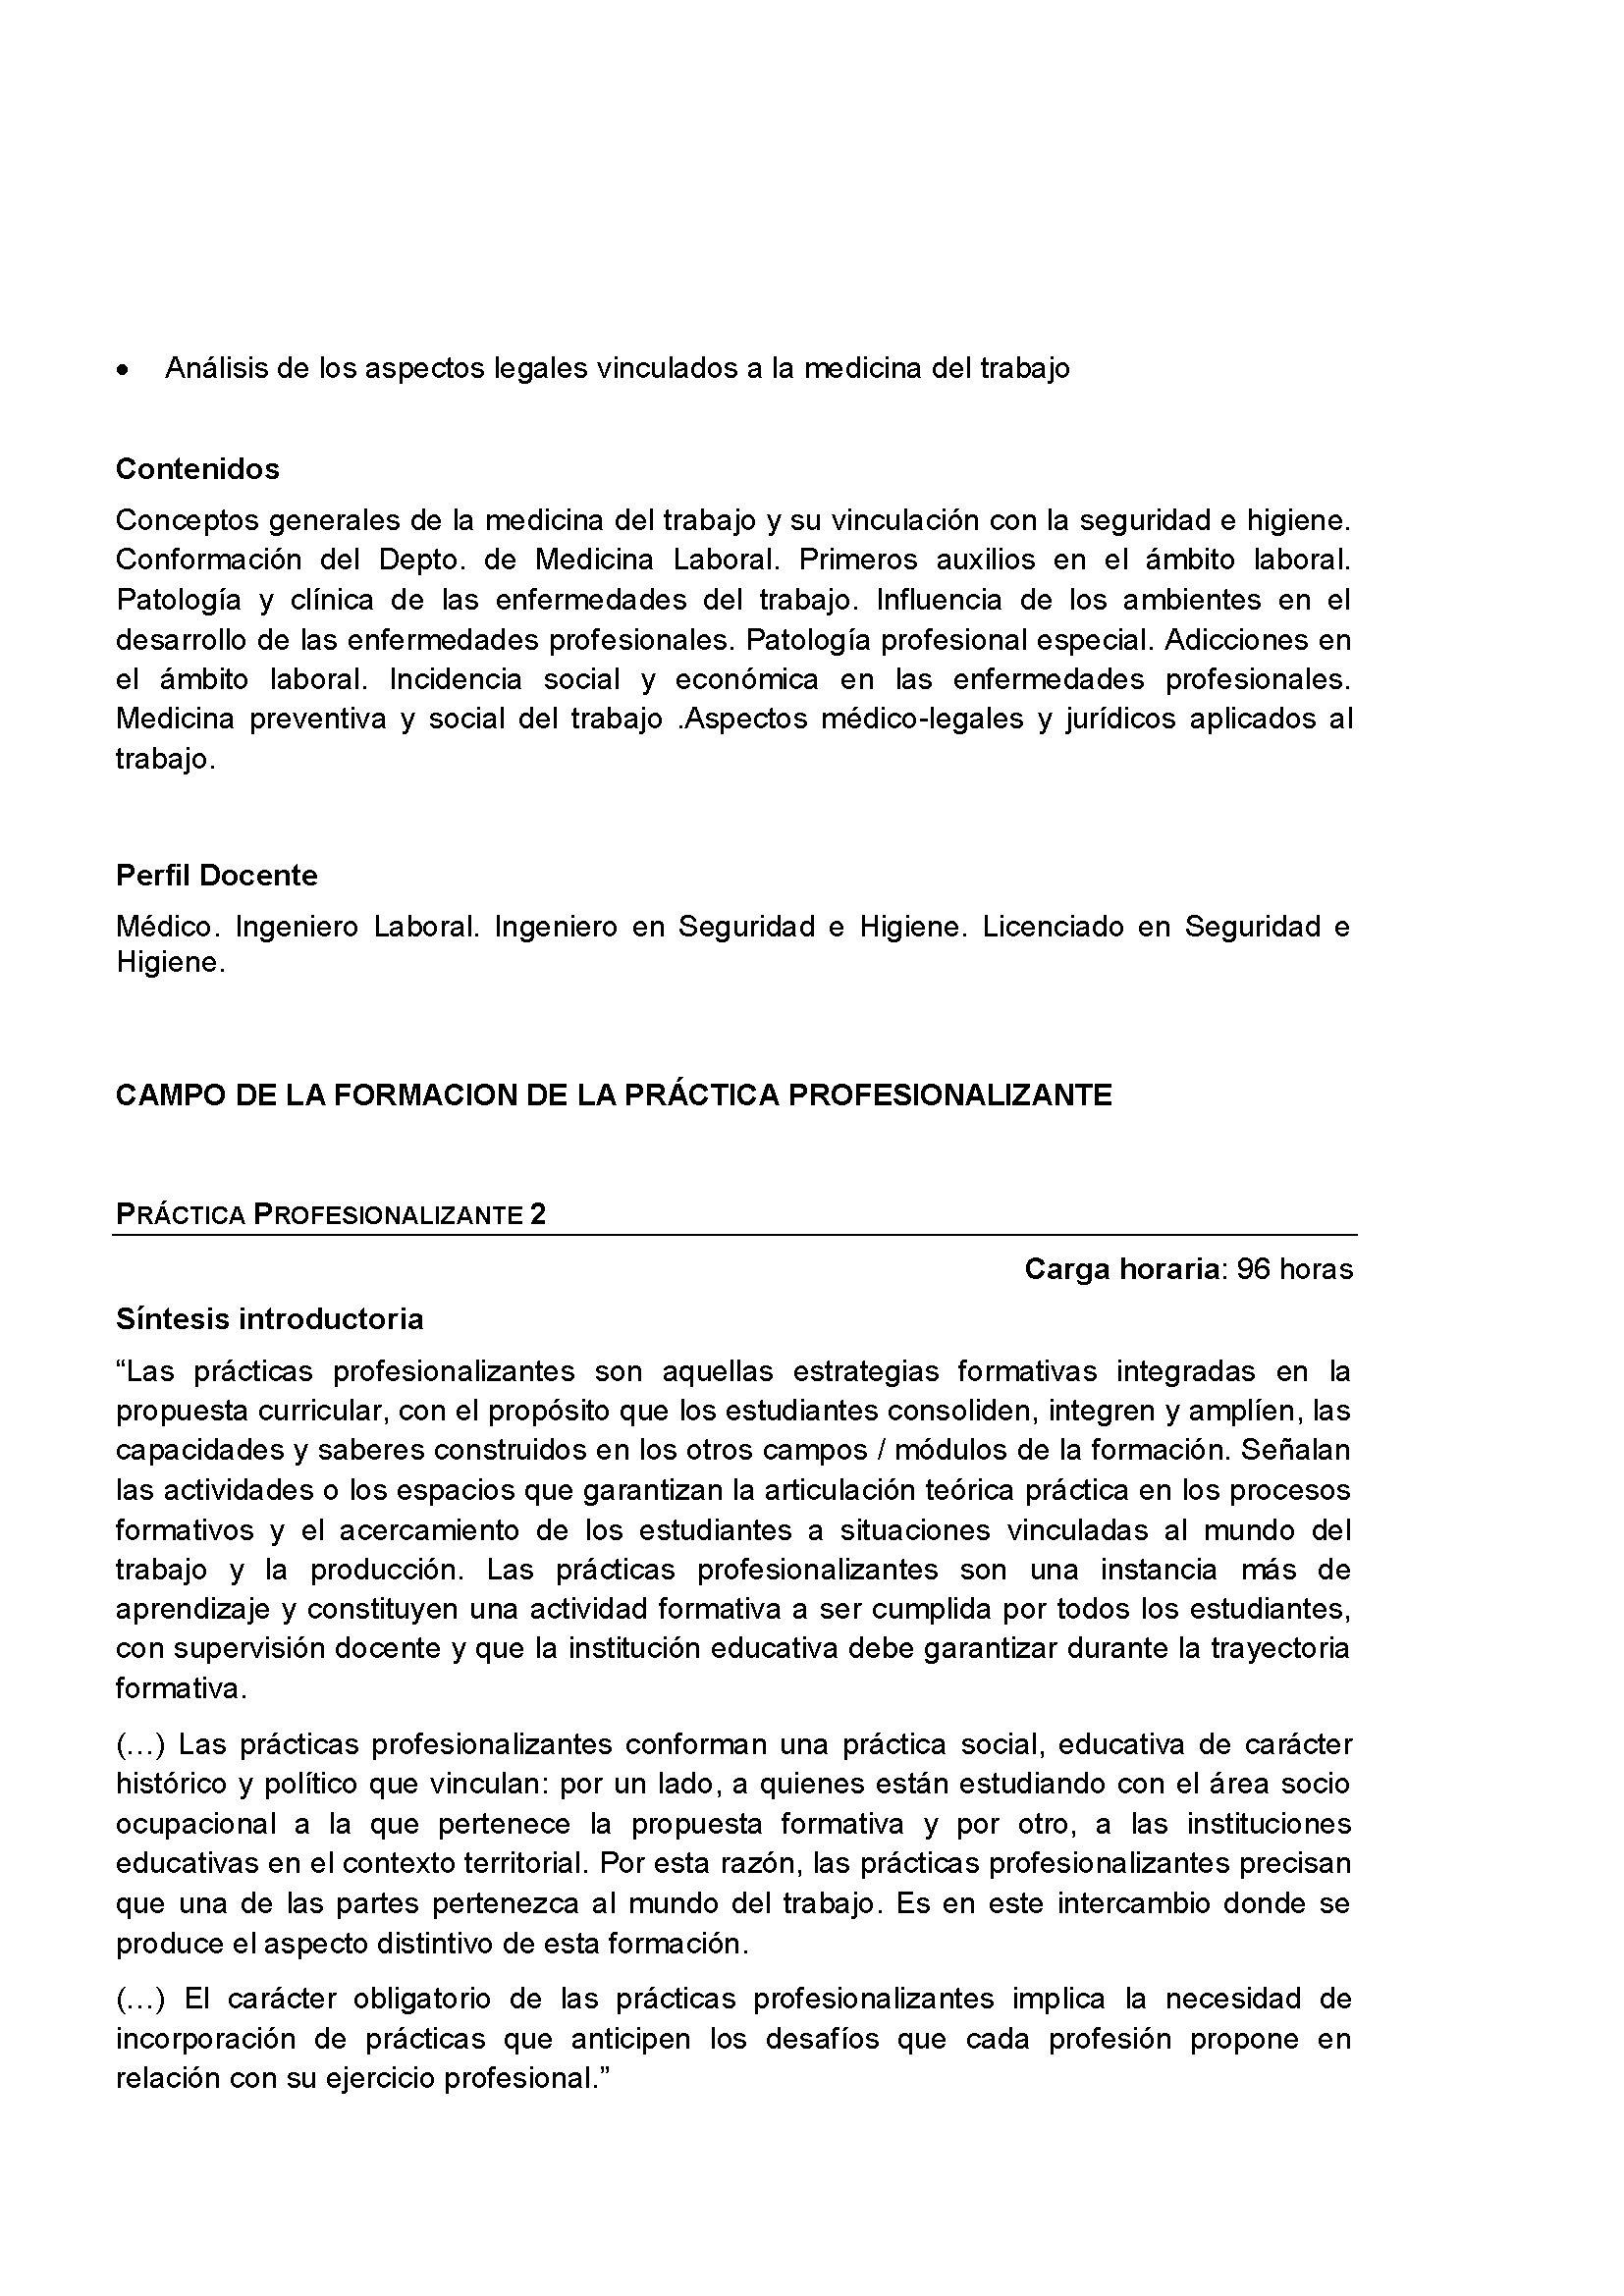 320-13 TS Seg e Hig Final (Plan Nuevo)_Page_24